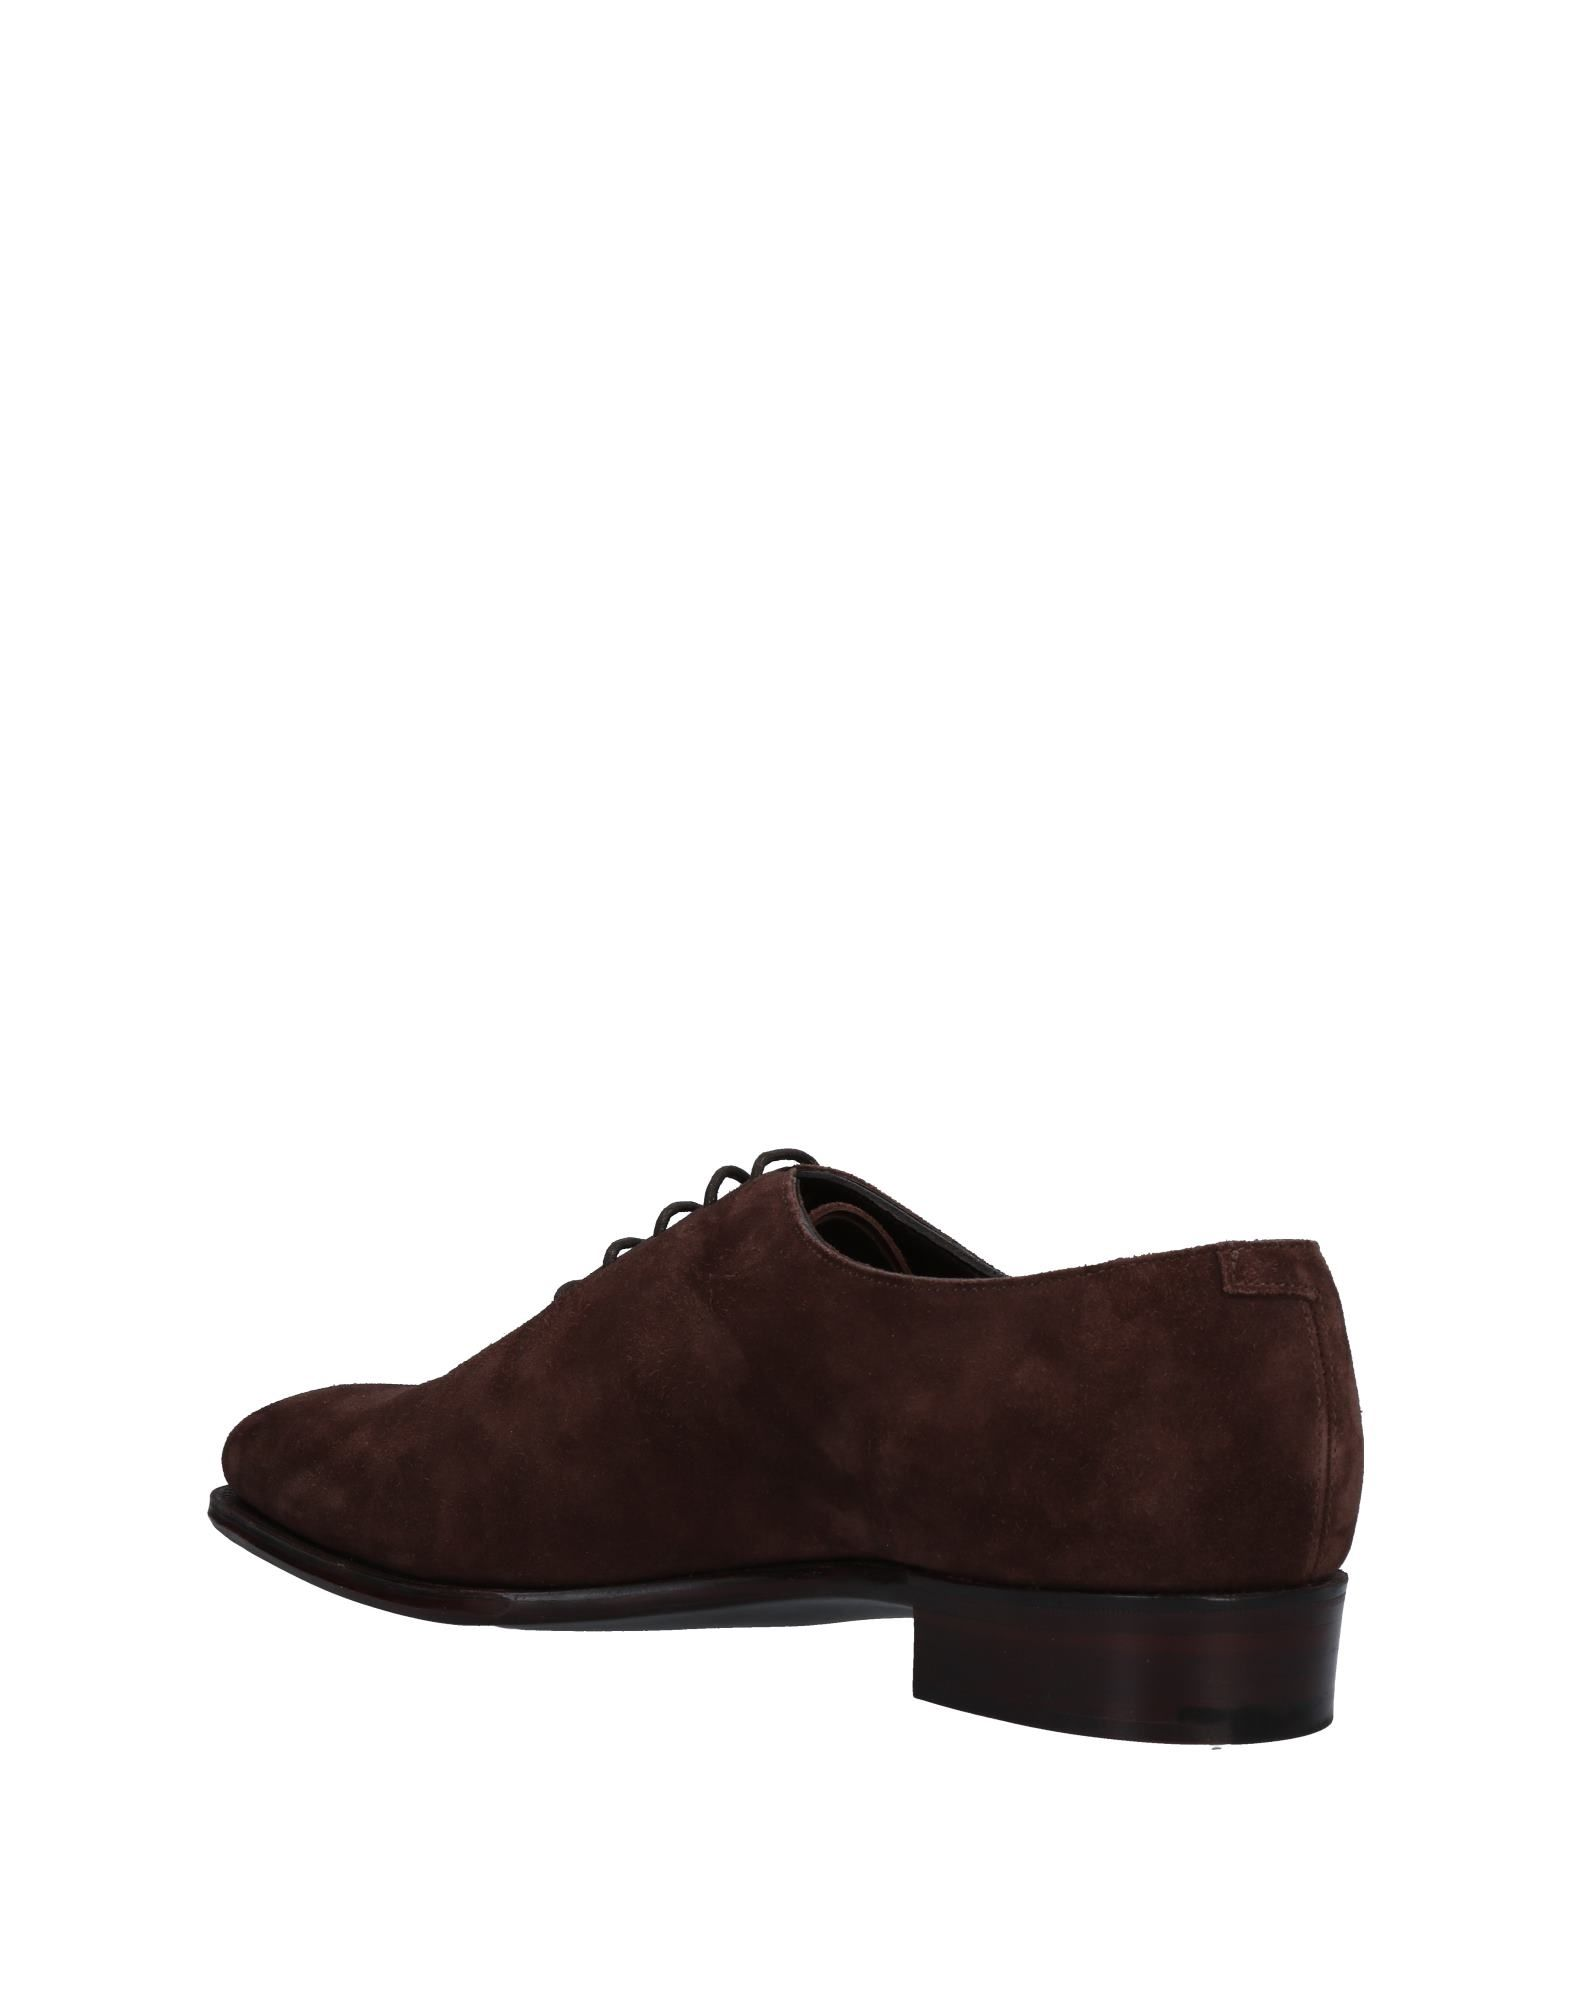 Kingsman By Schuhe George Cleverley Schnürschuhe Herren  11477417PT Heiße Schuhe By f740d2